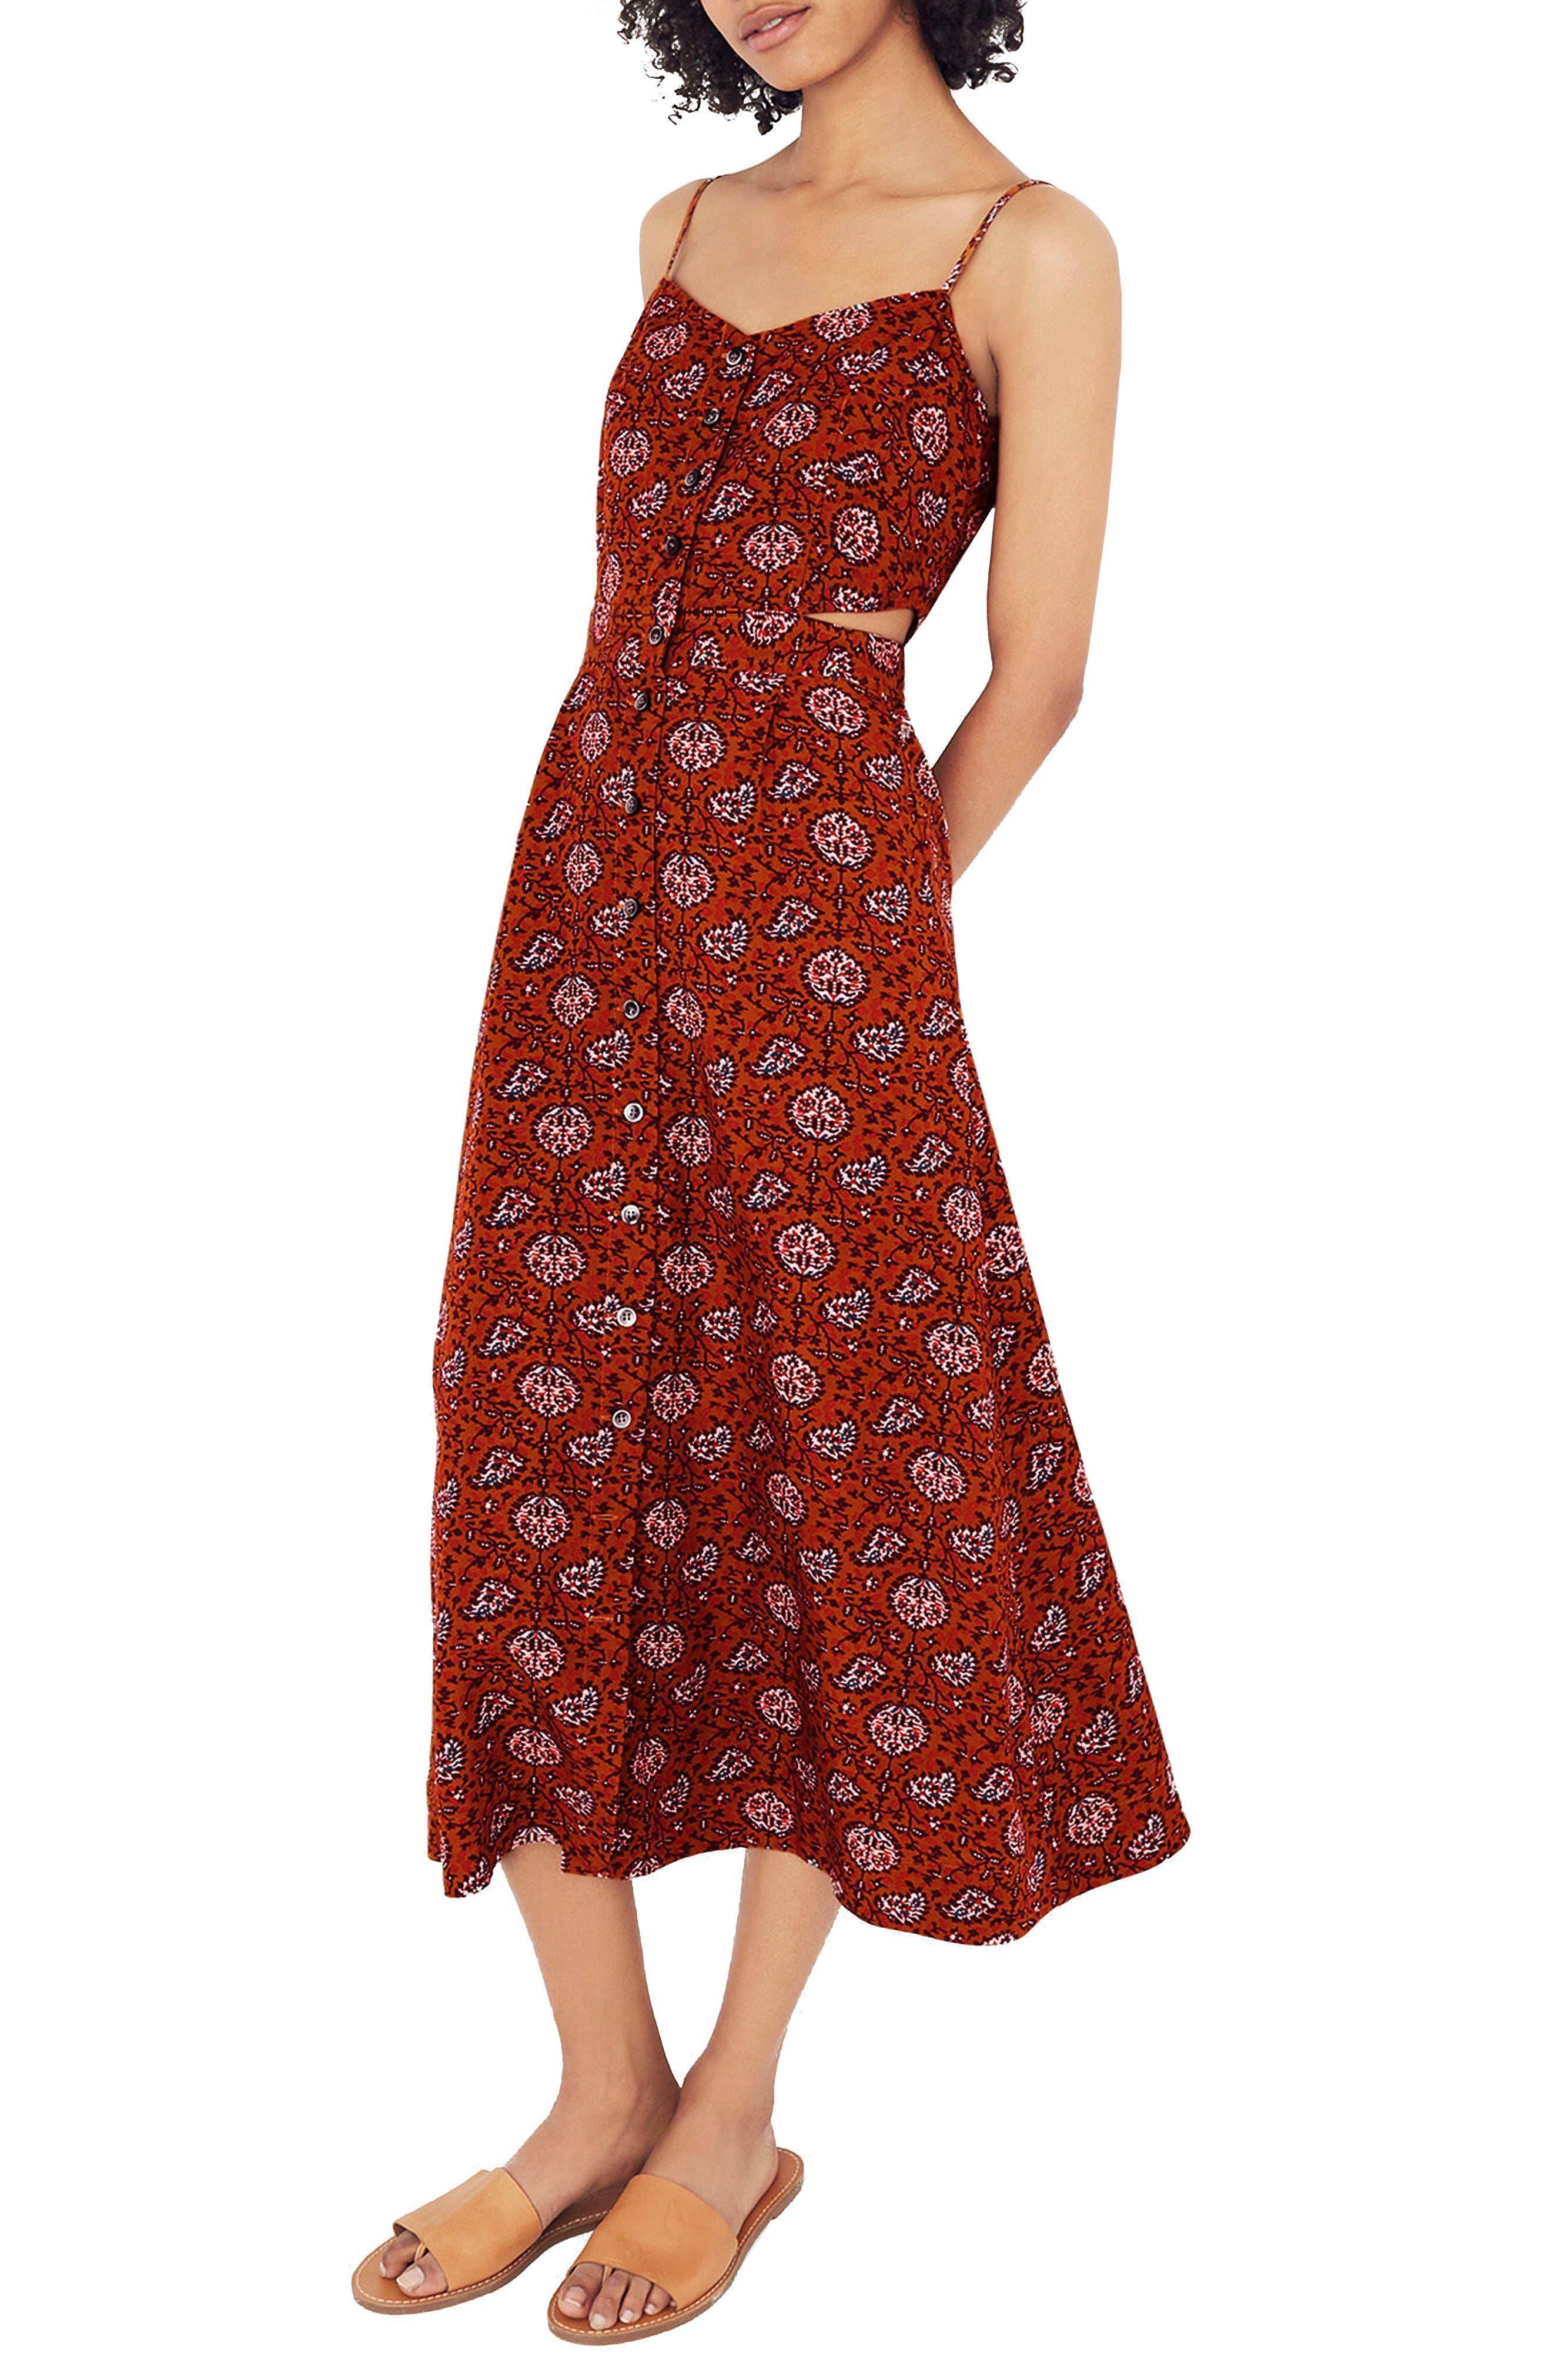 MADEWELL Warm Paisley Cutout Camisole Midi Dress, Main, color, 200